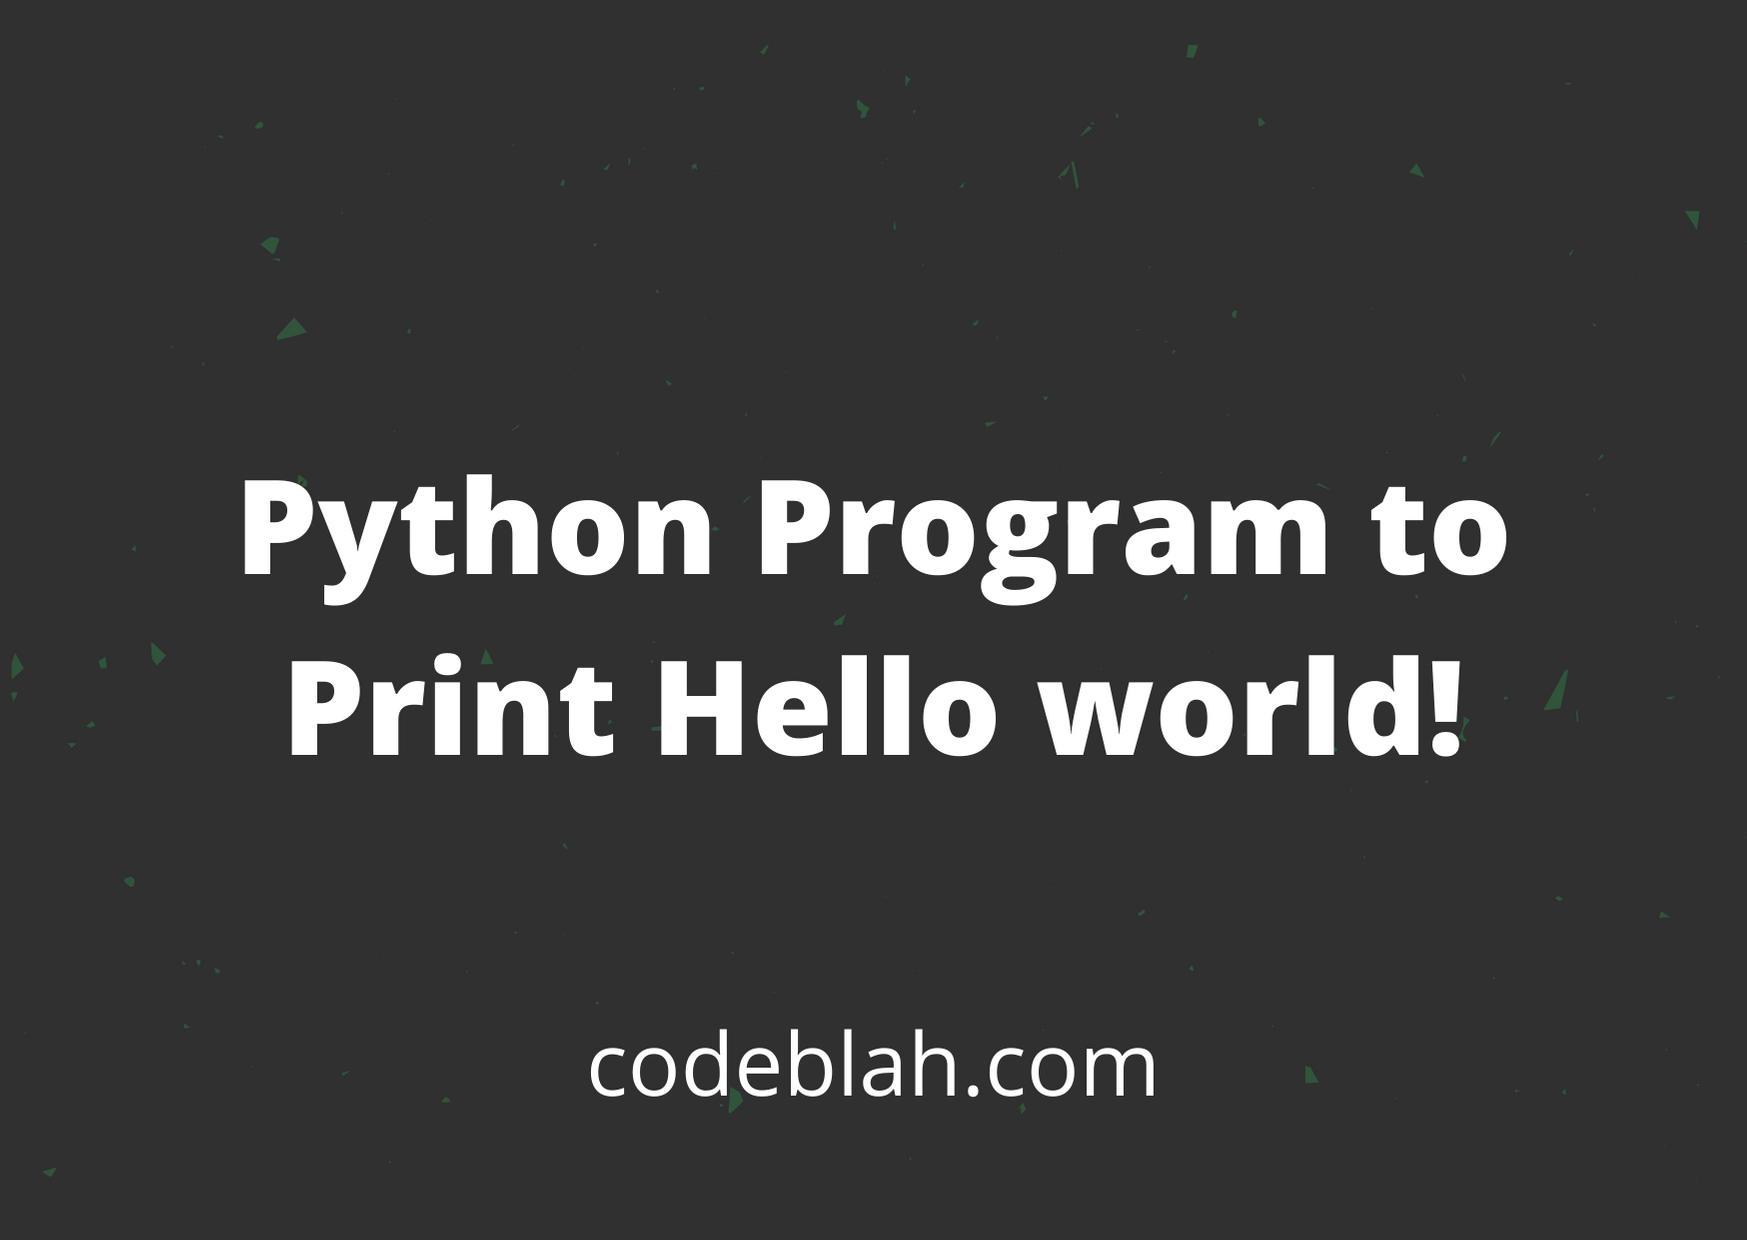 Python Program to Print Hello world!